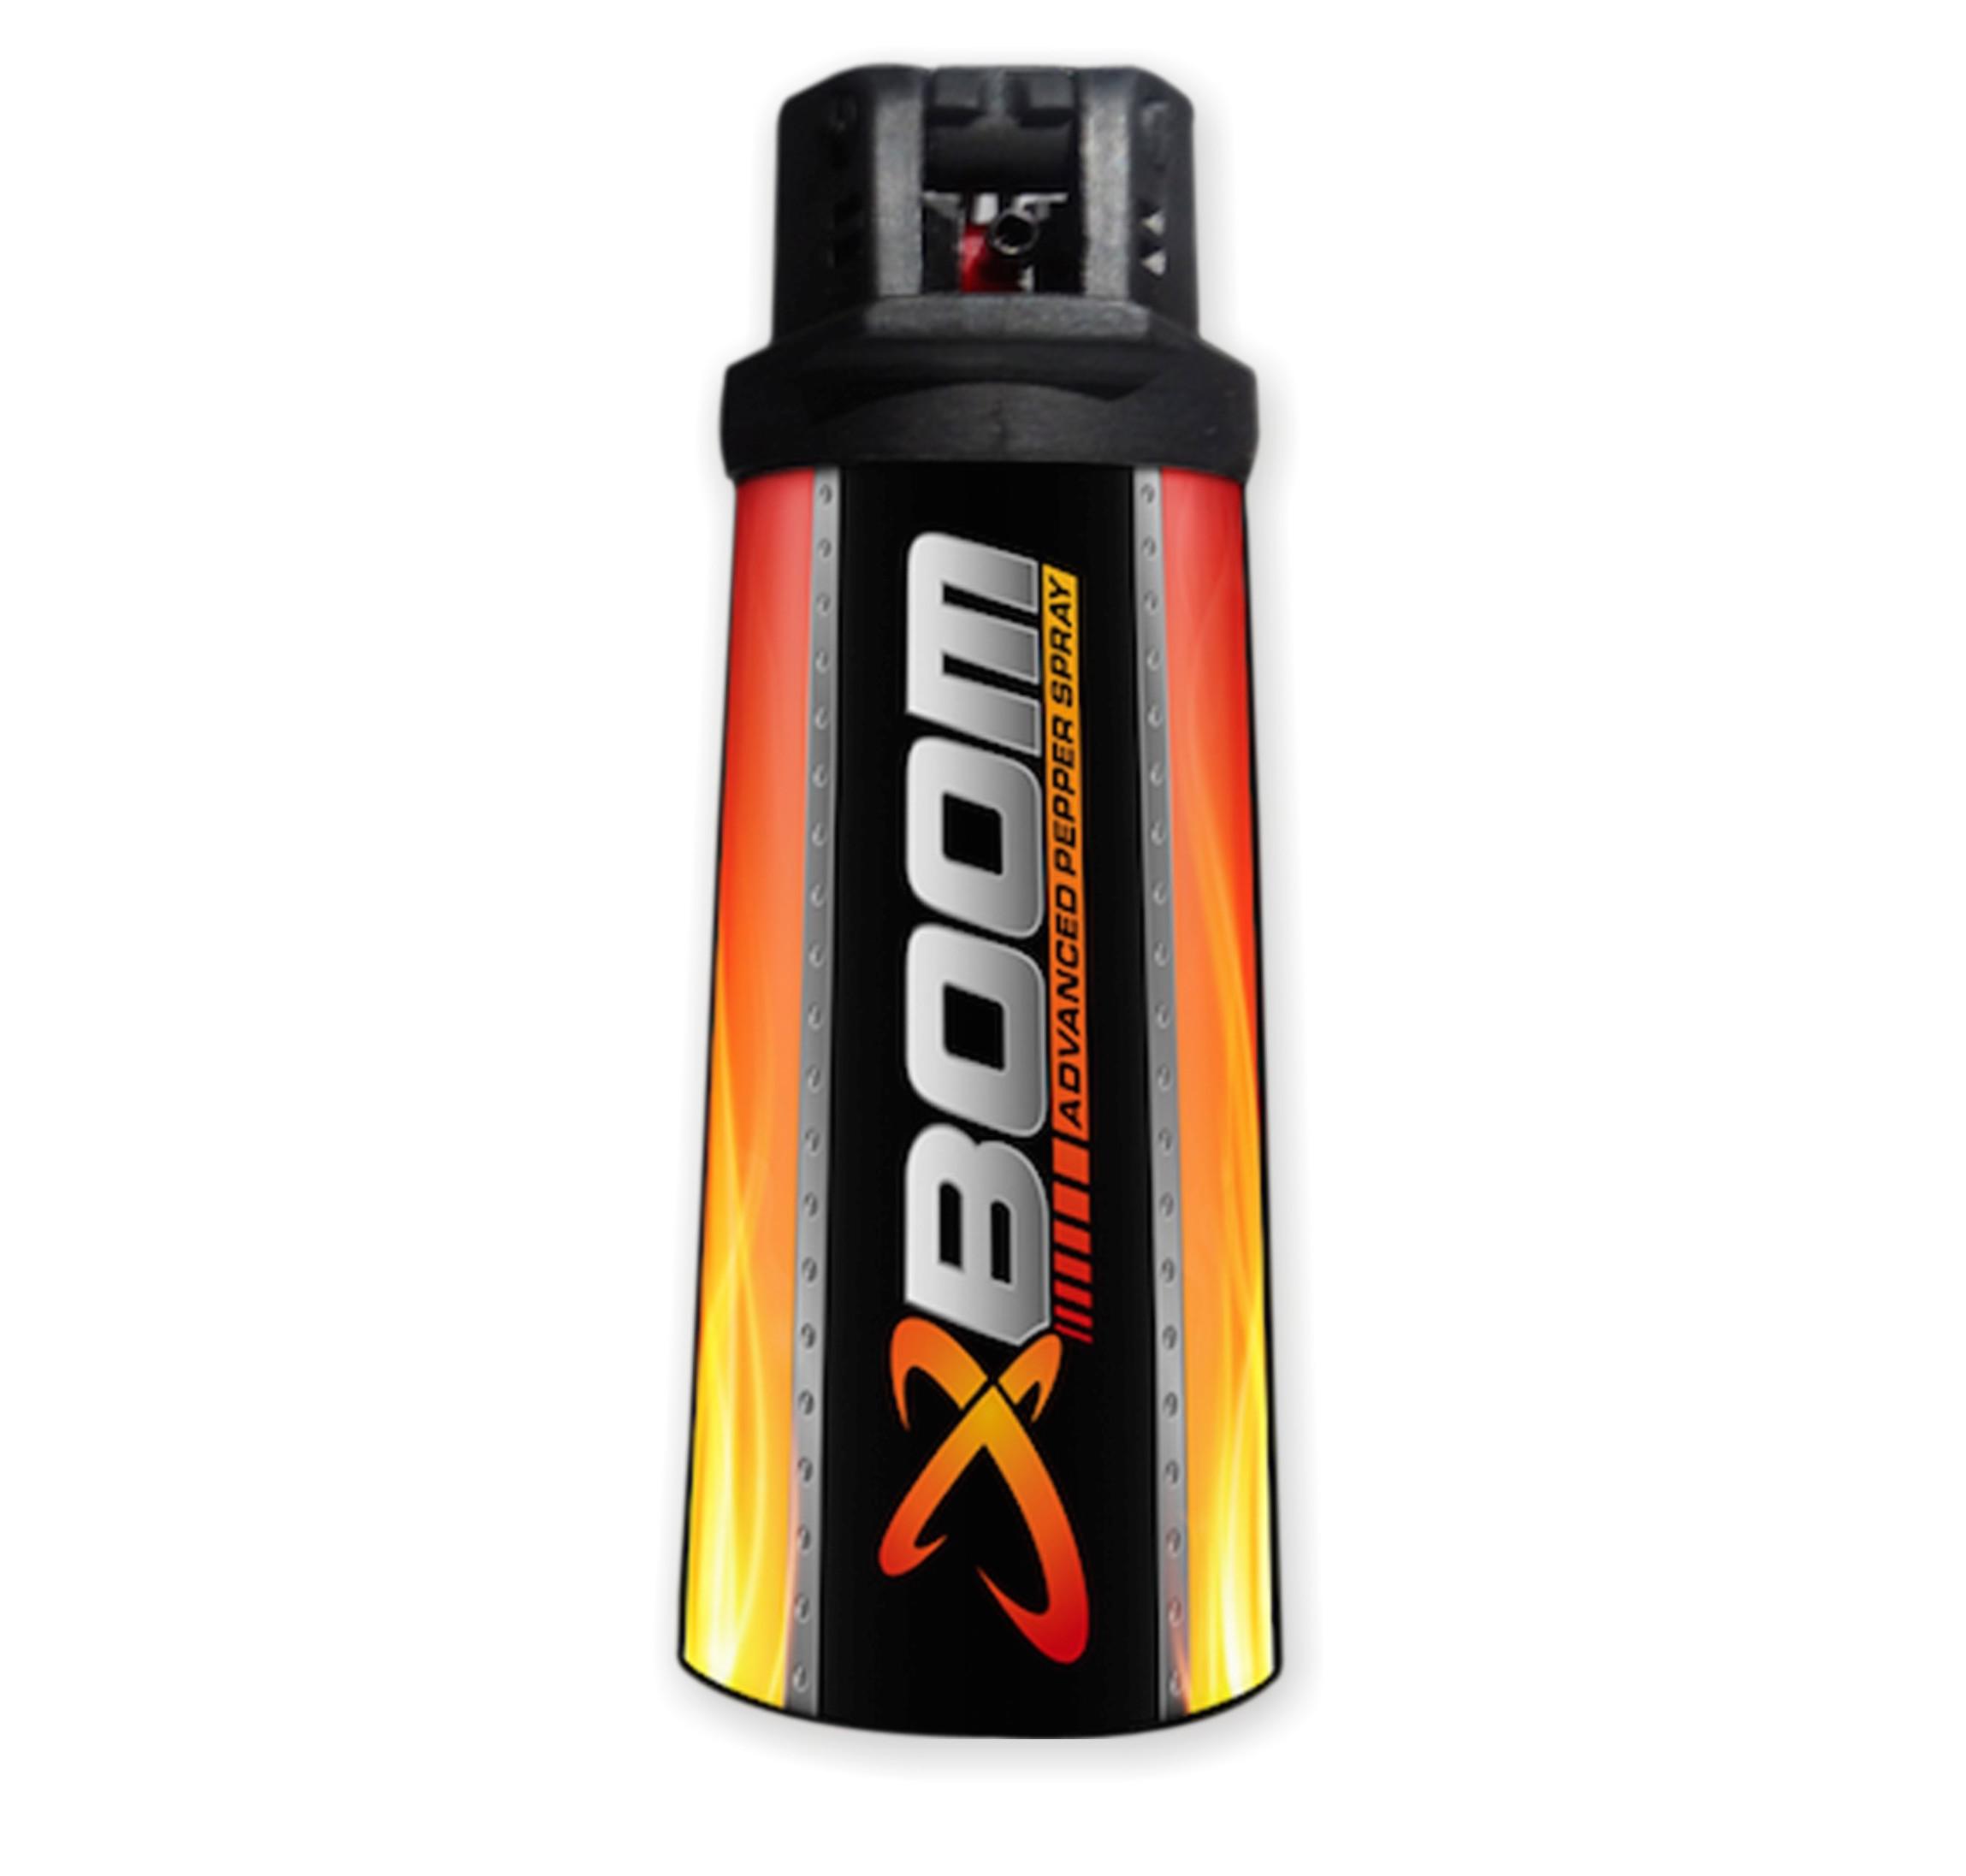 XBOOM UTILITIES PVT LTD